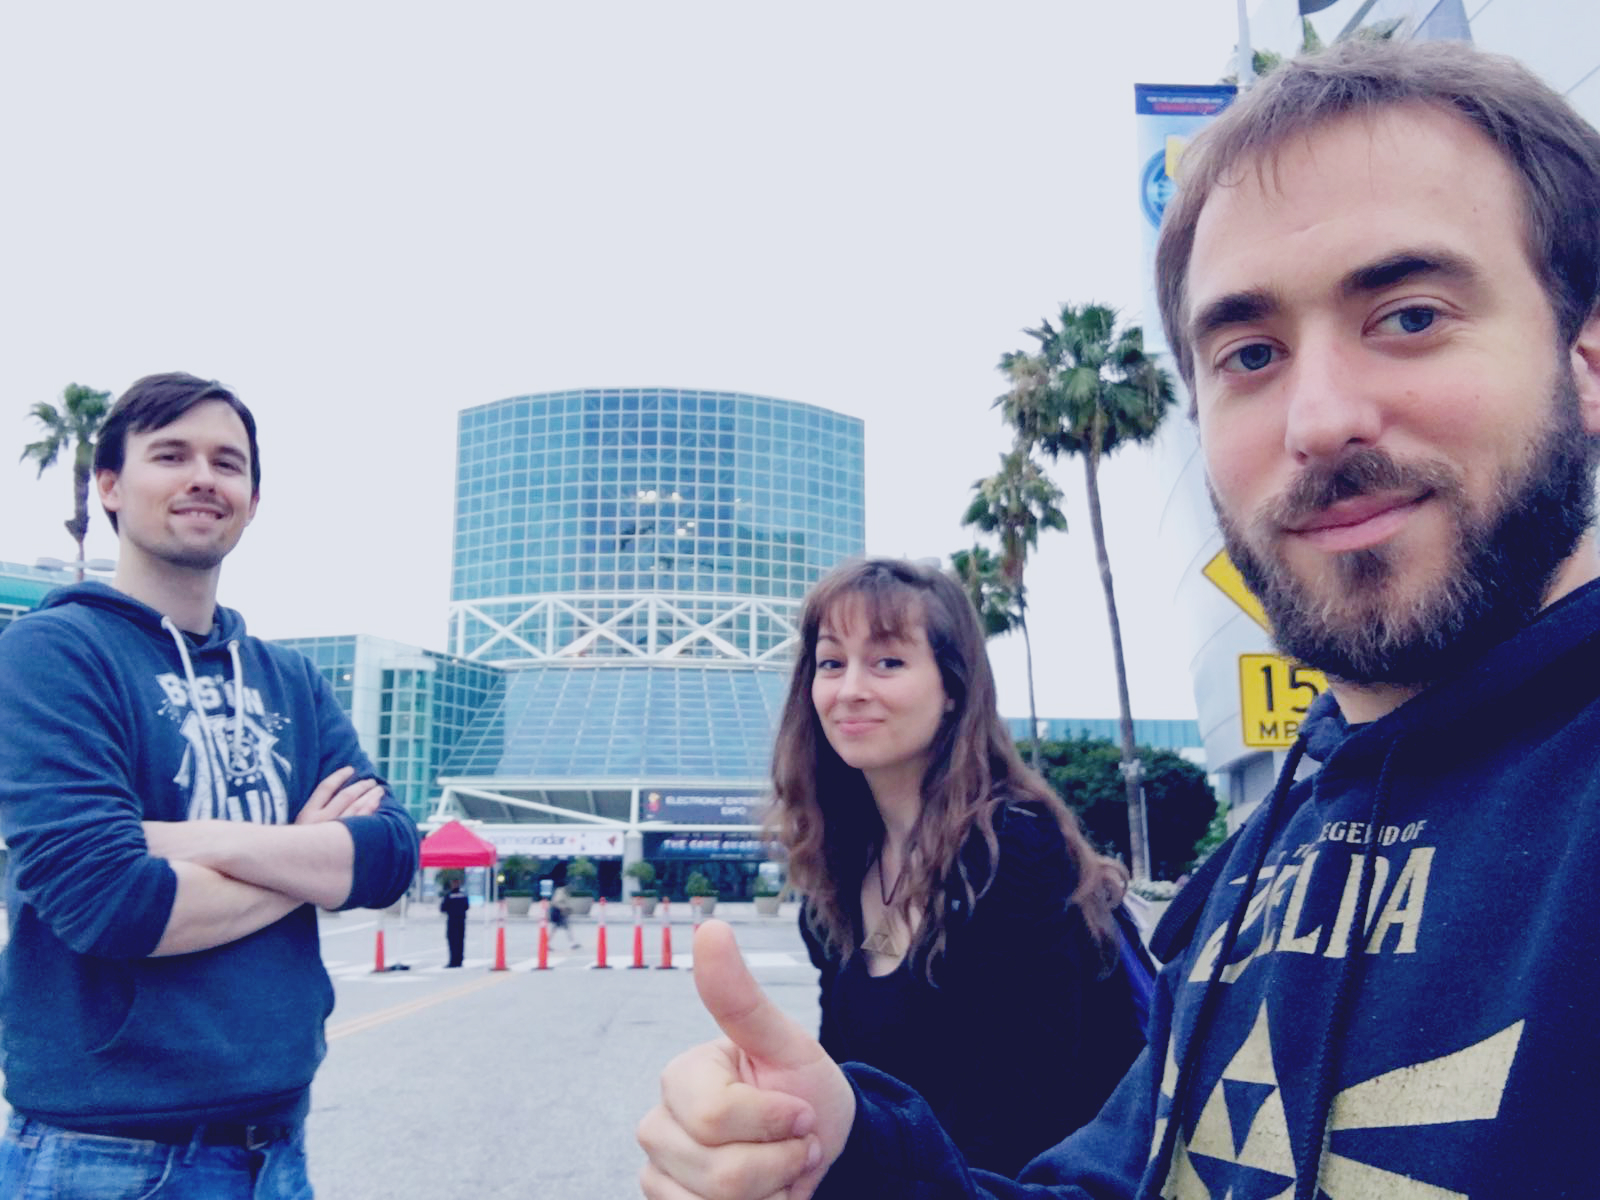 Toothpick, NekoCam et Gorn à l'E3 2016 !